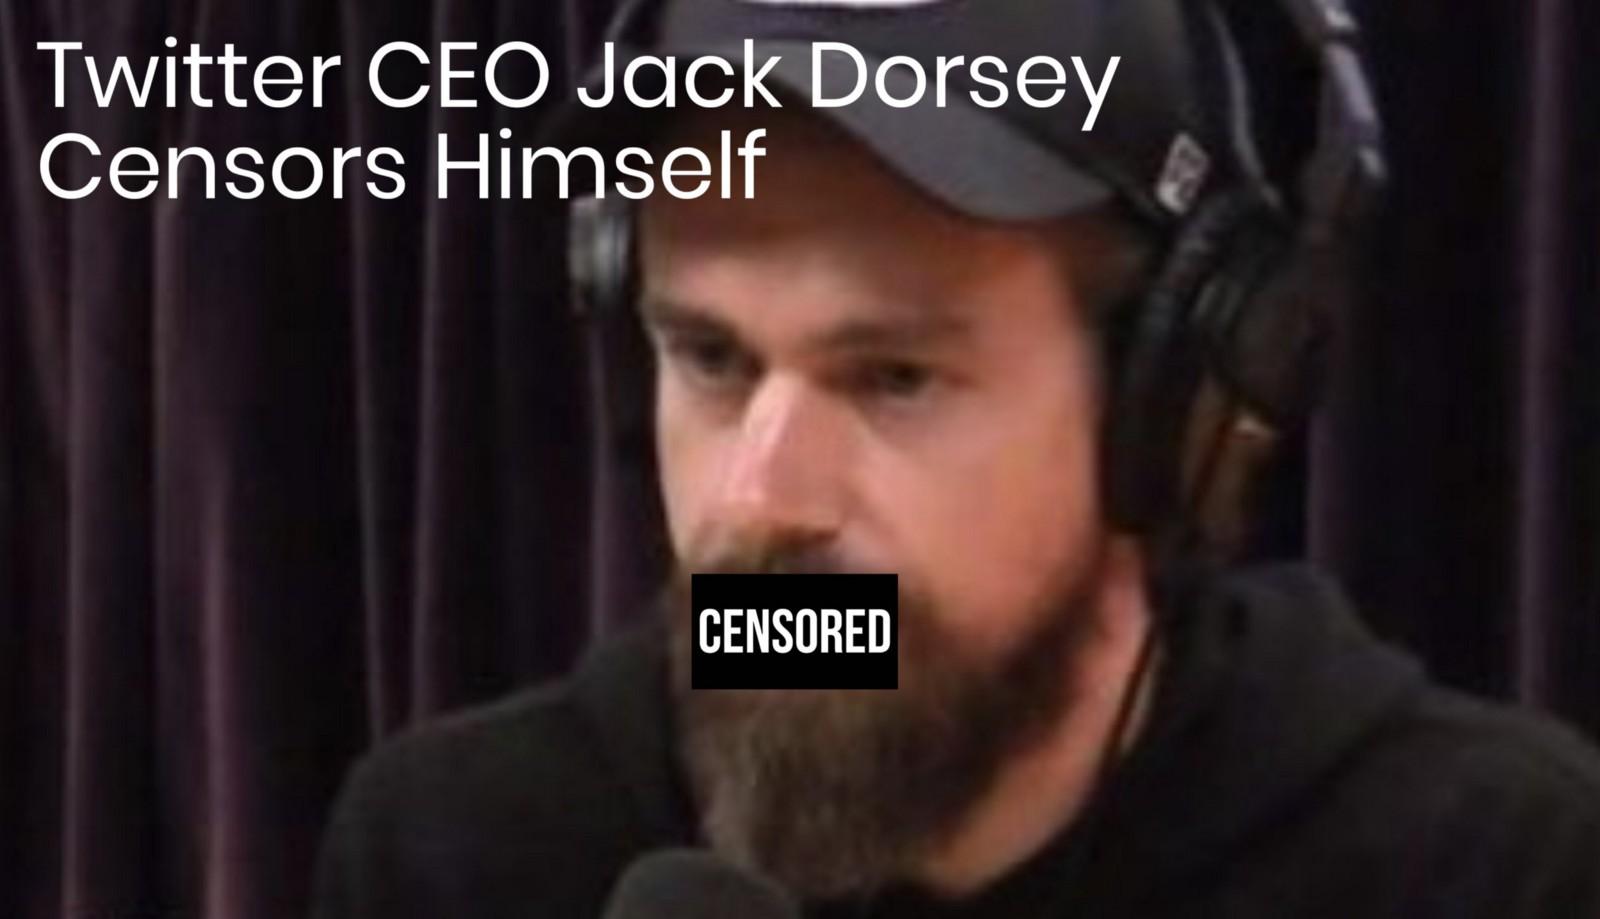 /twitter-ceo-jack-dorsey-censors-himself-on-joe-rogan-podcast-b9211ea10dfd feature image